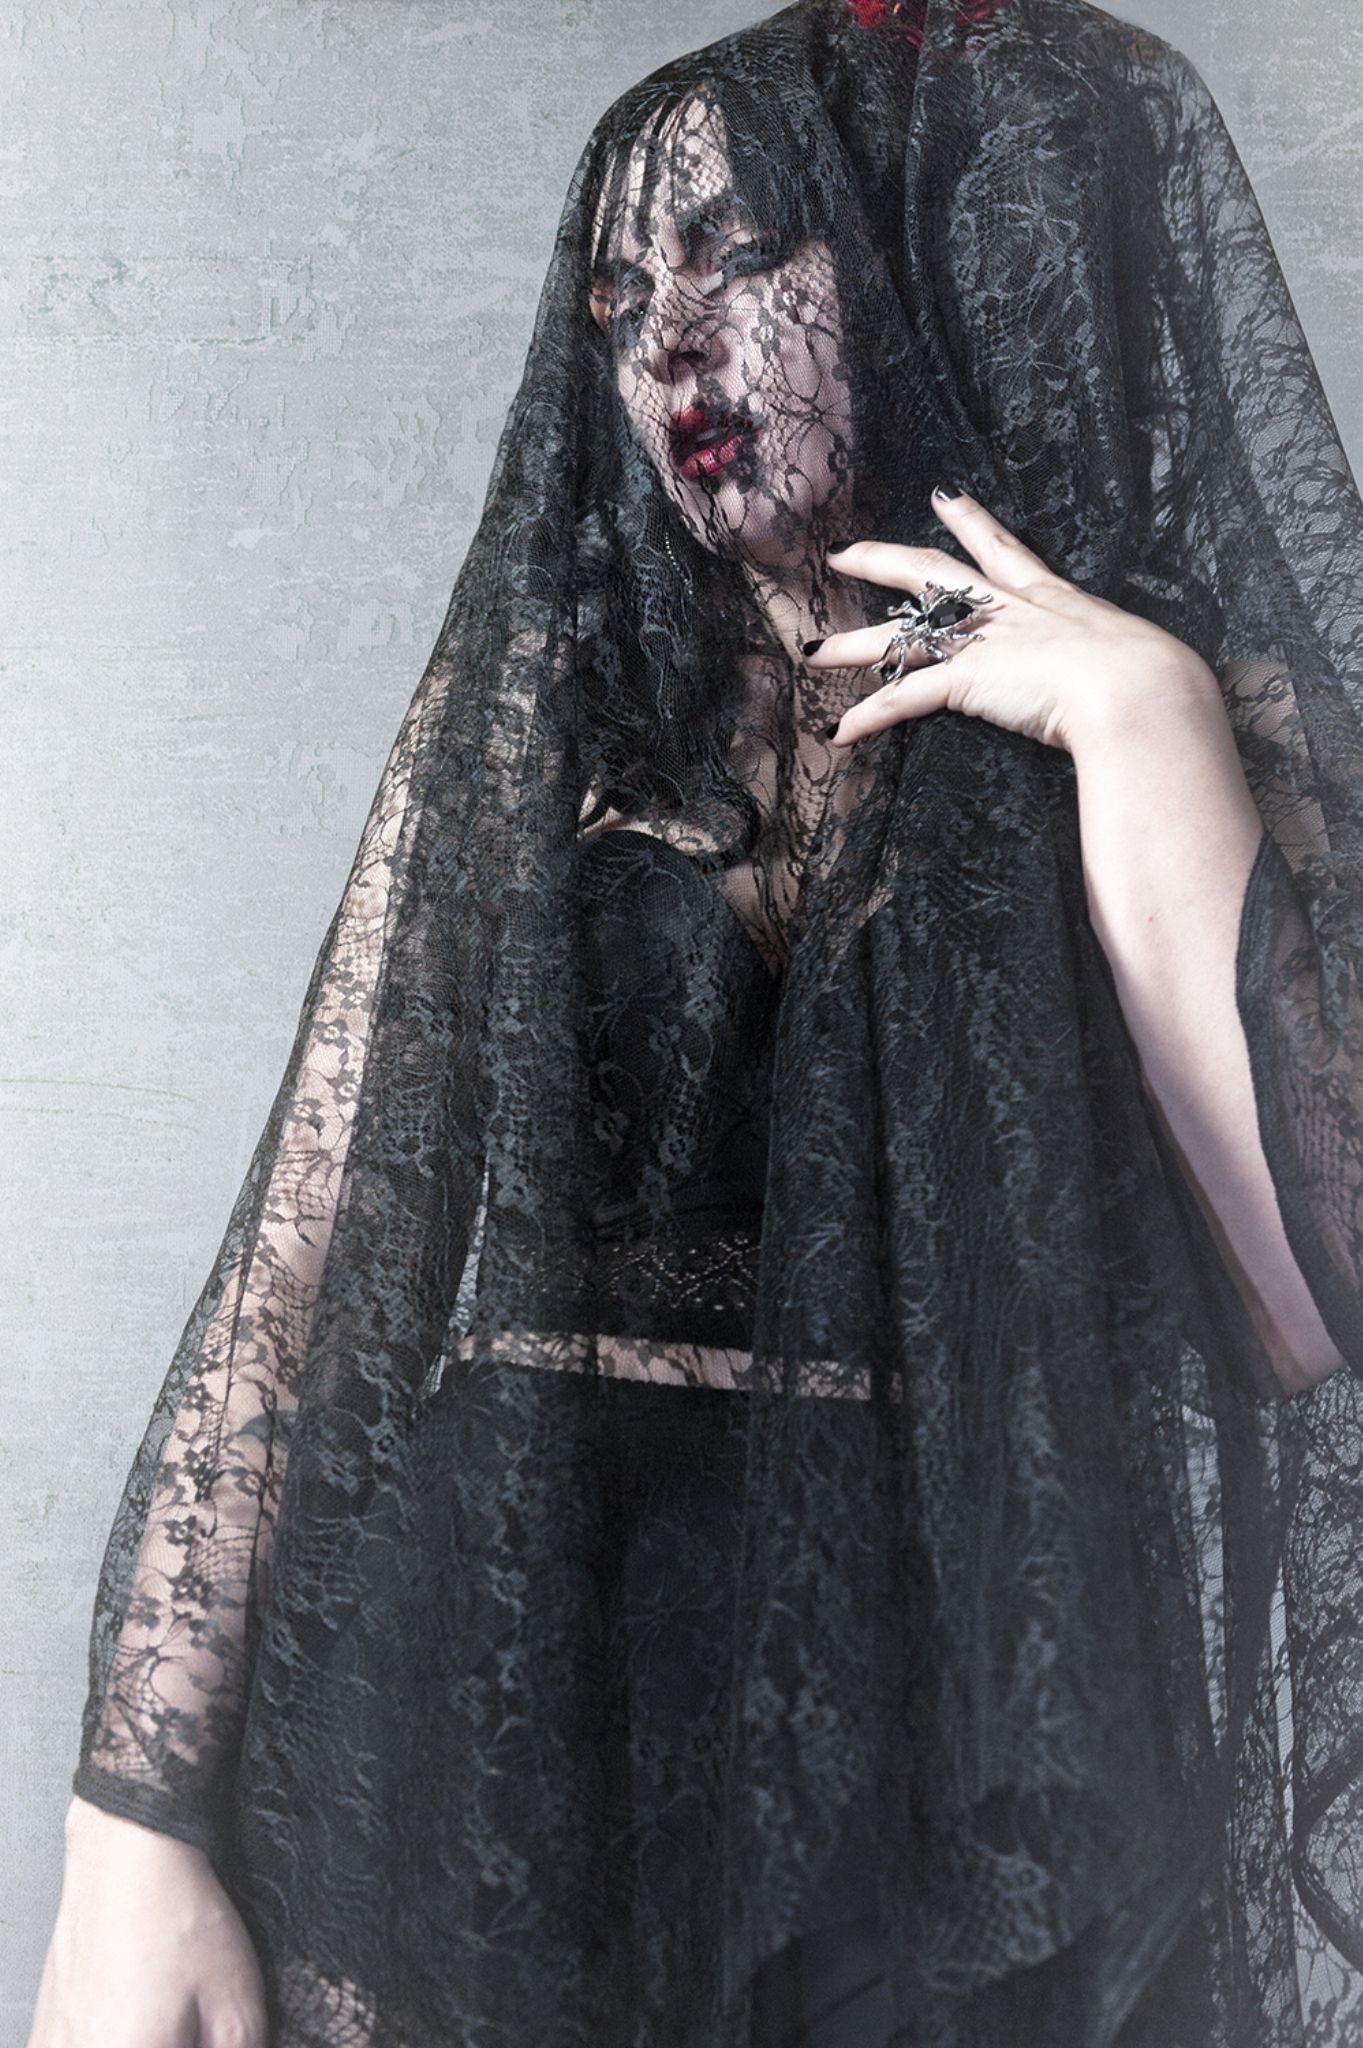 Black Widow by candiceghai